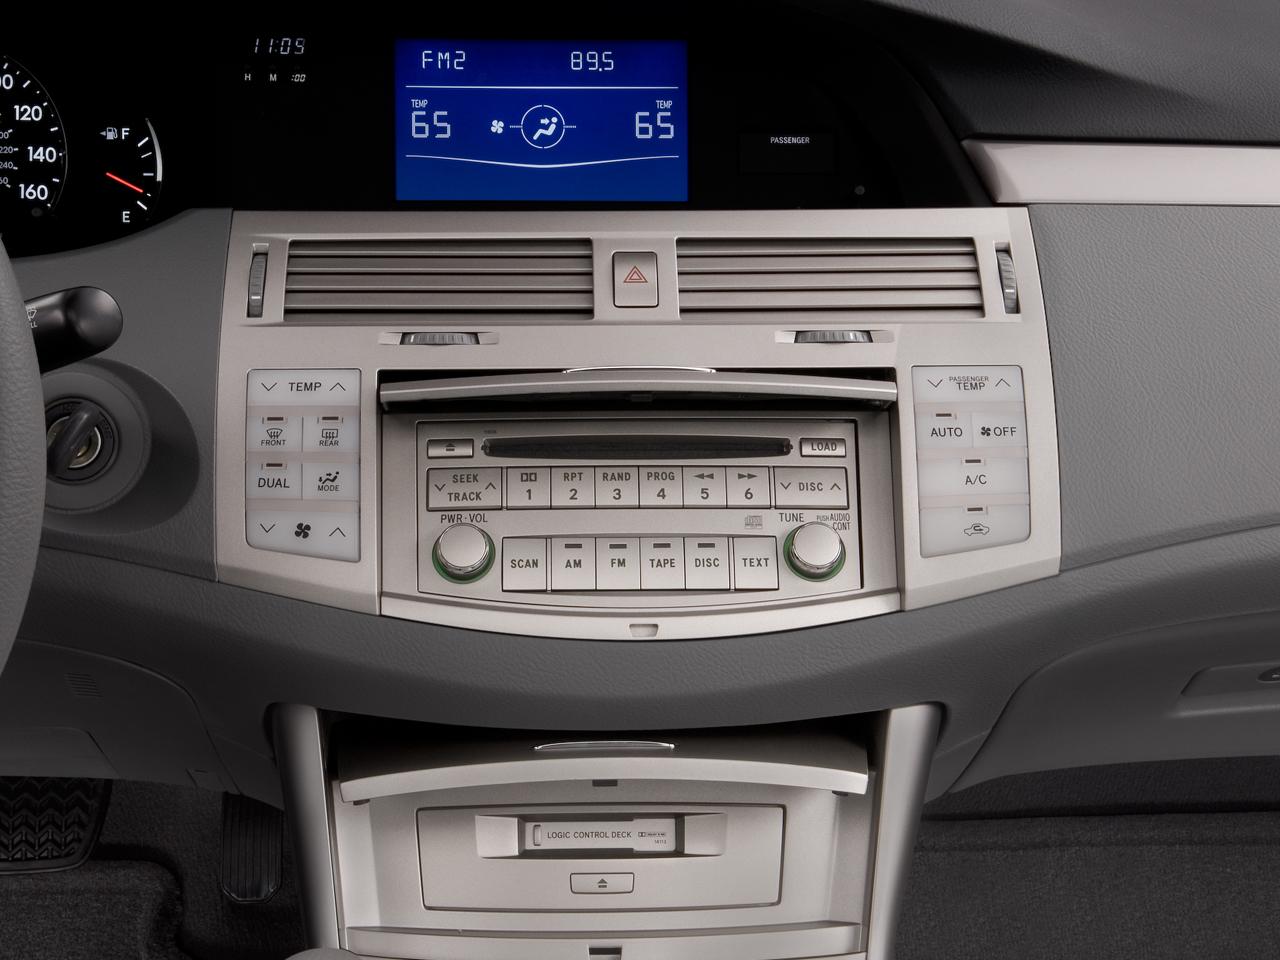 2008 Toyota Avalon Xls - New Toyota Midsize Sedan Review